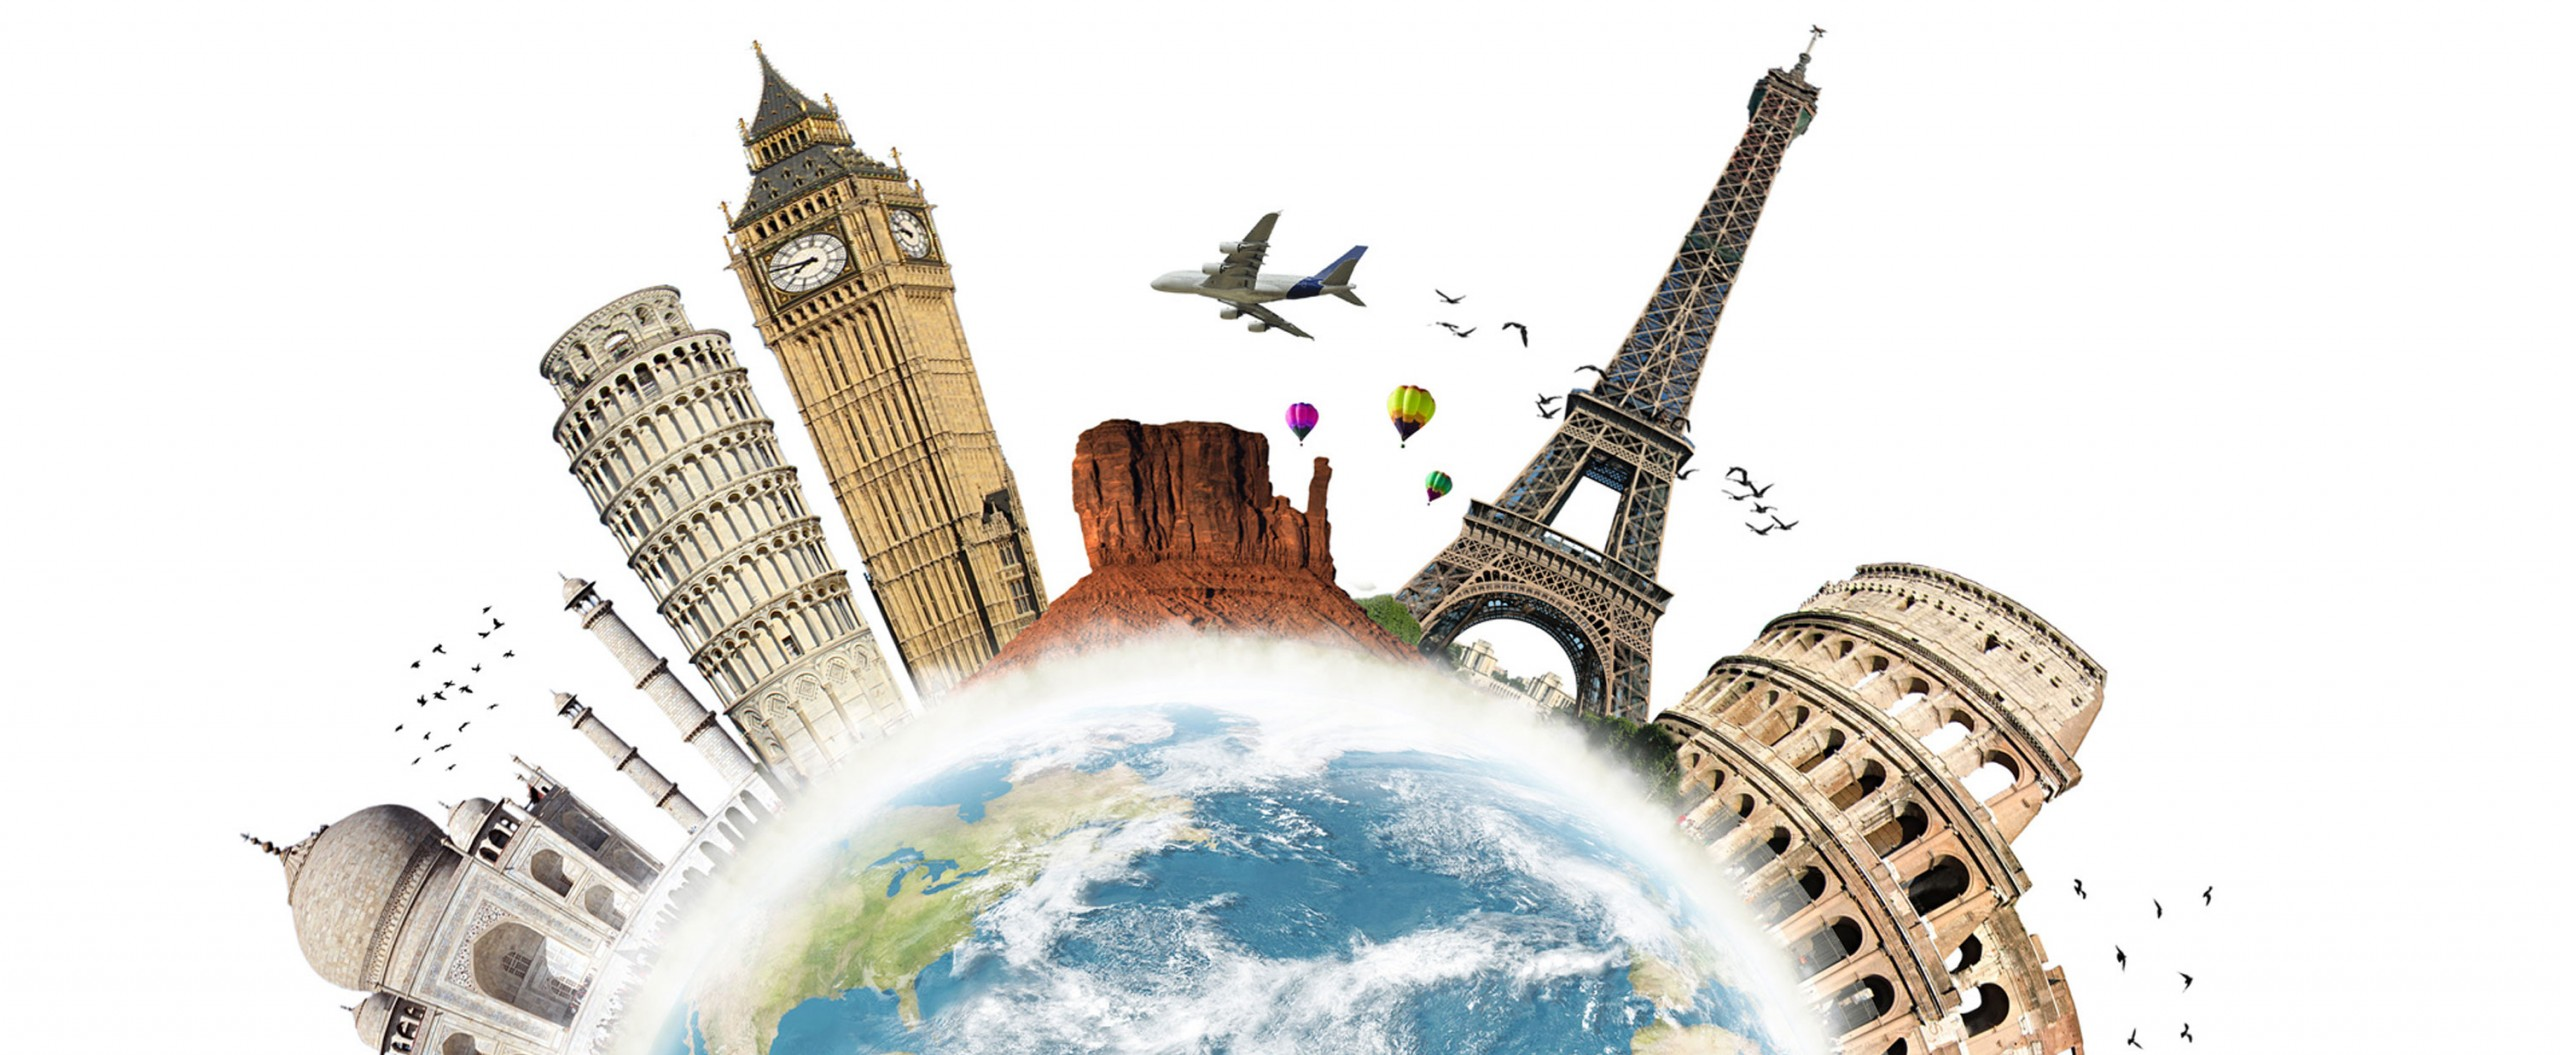 Travel-Accessories-2560x1055 Travel